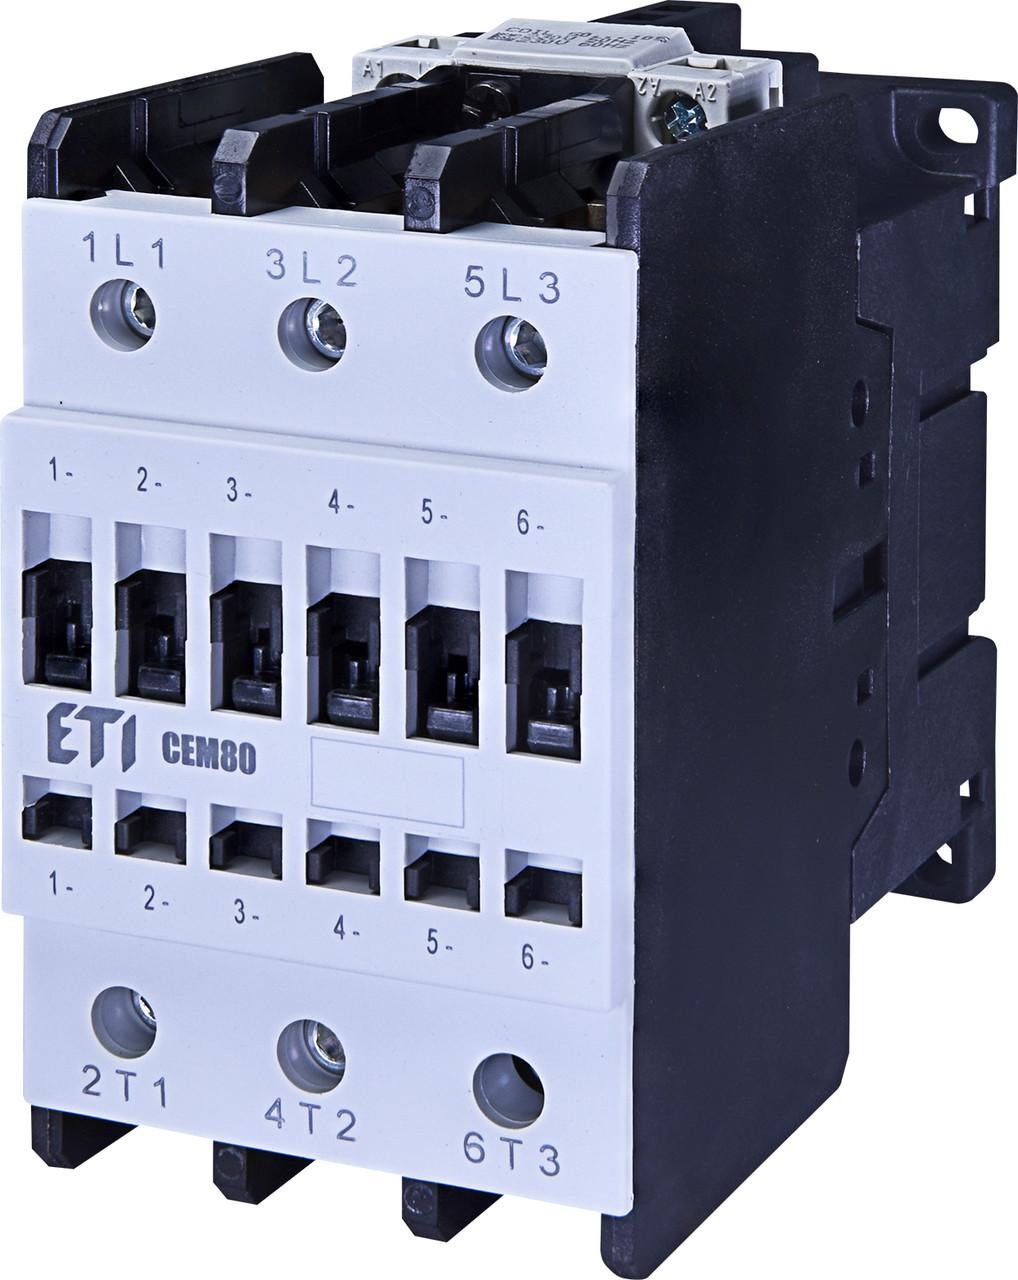 Контактор силовой ETI CEM 80.00 80А 230V AC 3NO 37kW 4650103 (на DIN-рейку, 110A AC1, 80A AC3)